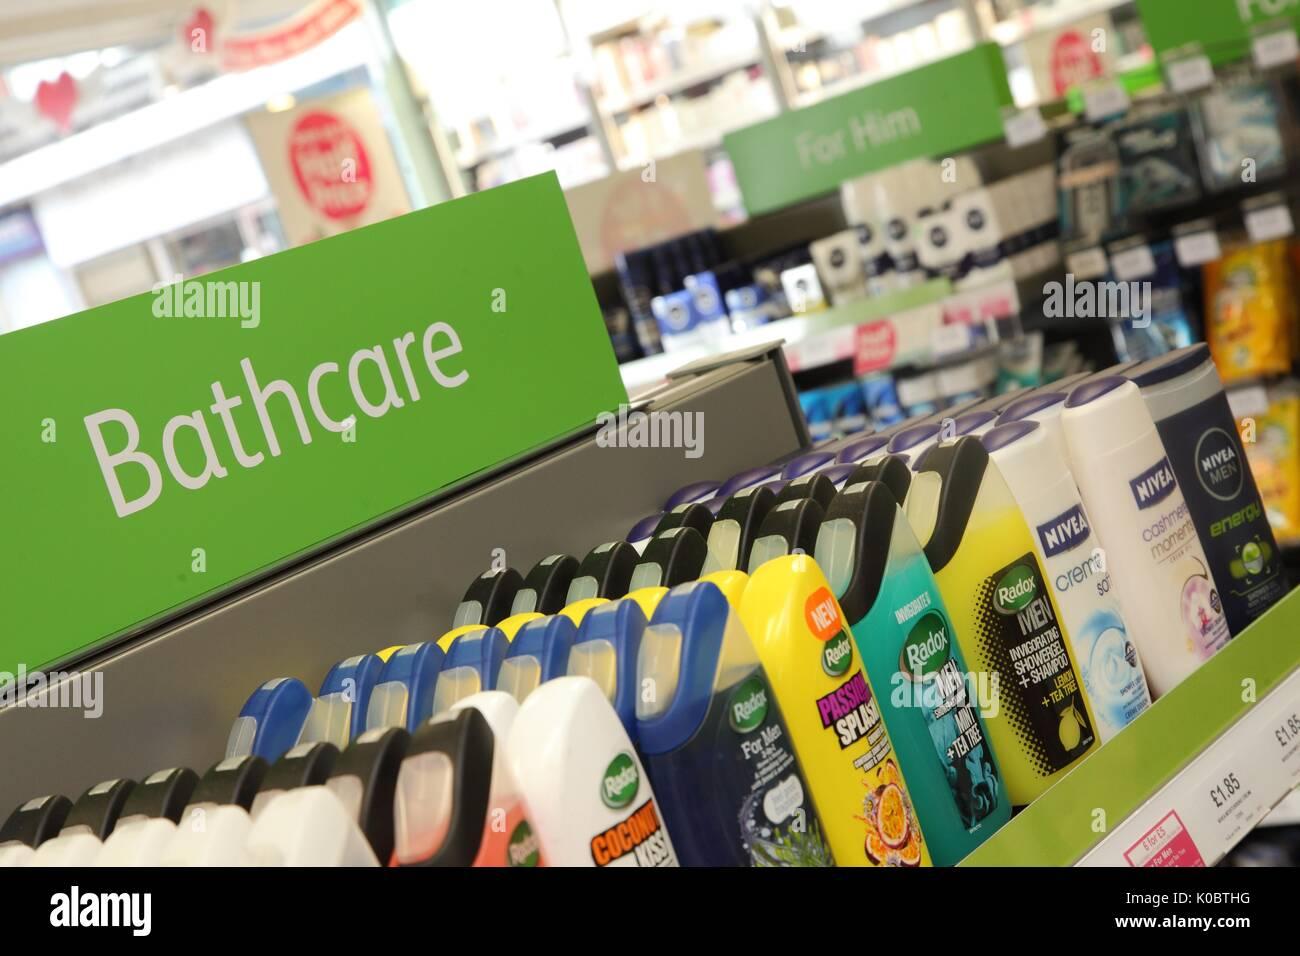 Bathcare products in a chemist shop,pharmacy shelf,pharmacists,drug store Stock Photo